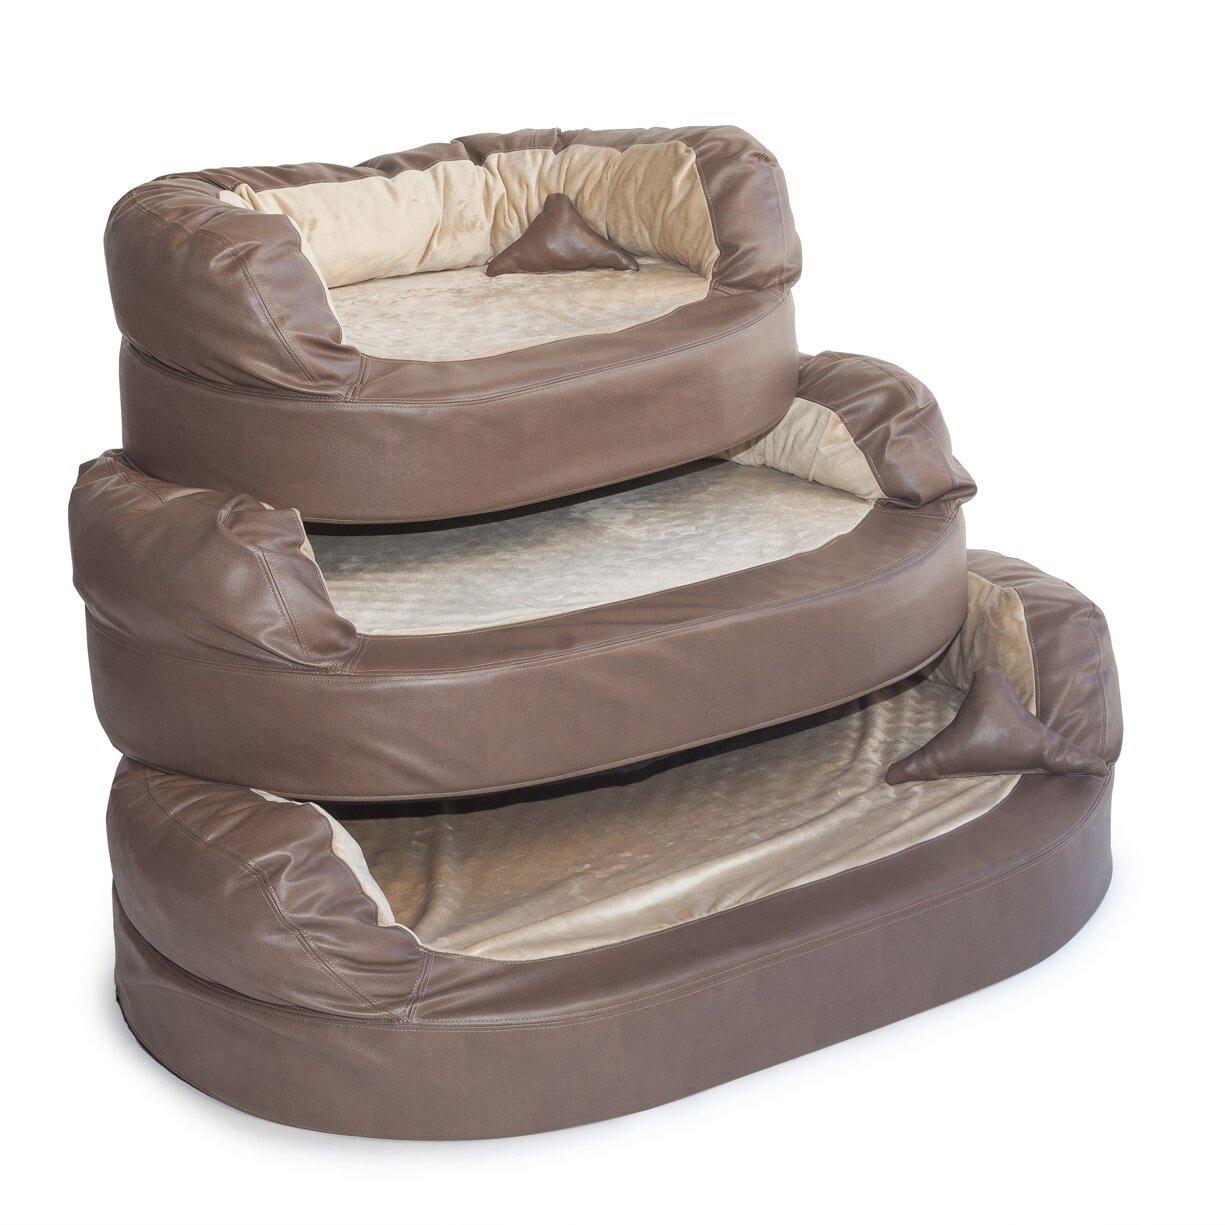 integrity bedding luxury orthopedic memory foam leatherette bolster dog bed reviews. Black Bedroom Furniture Sets. Home Design Ideas